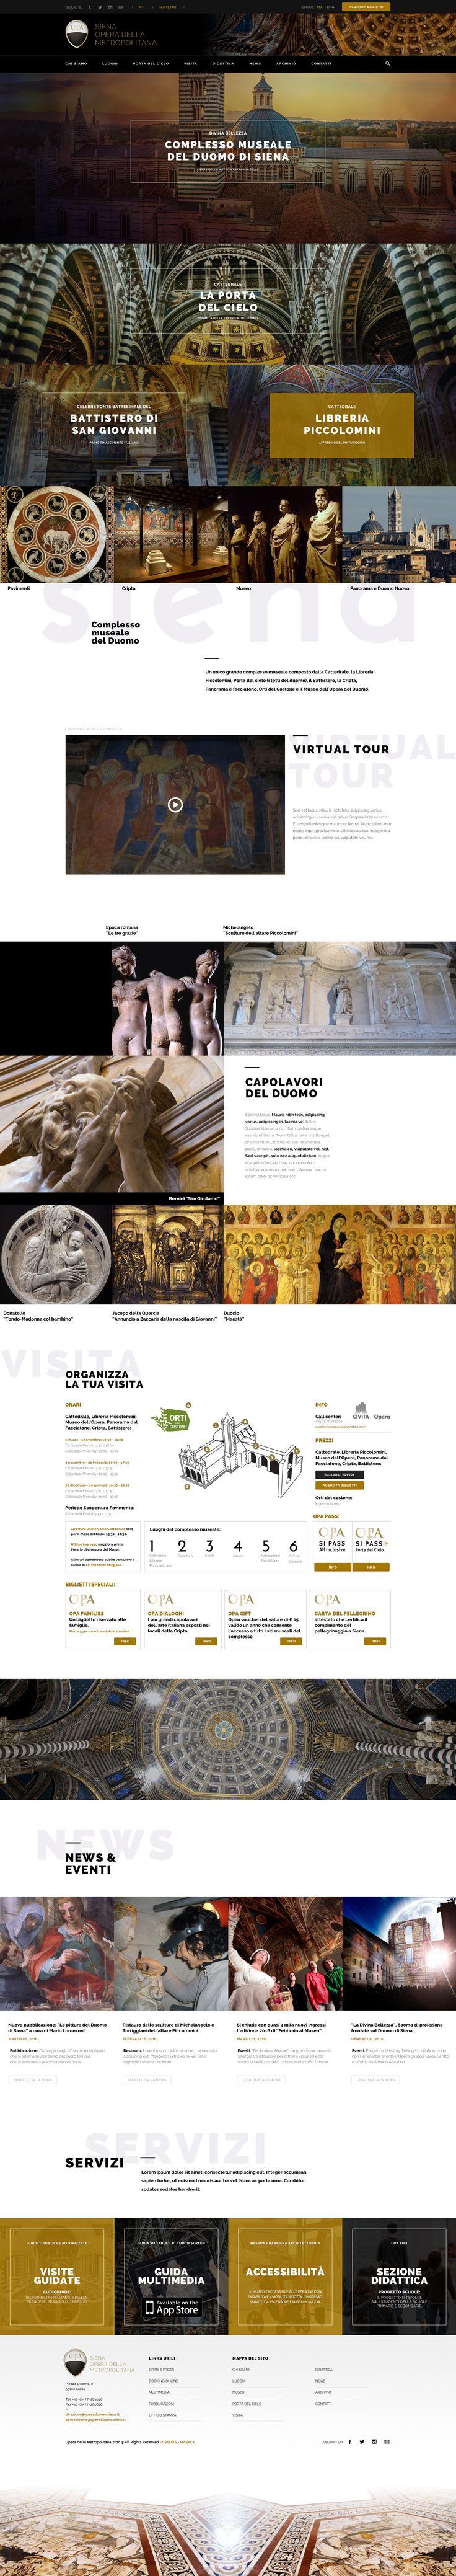 Siena Opera della Metropolitana